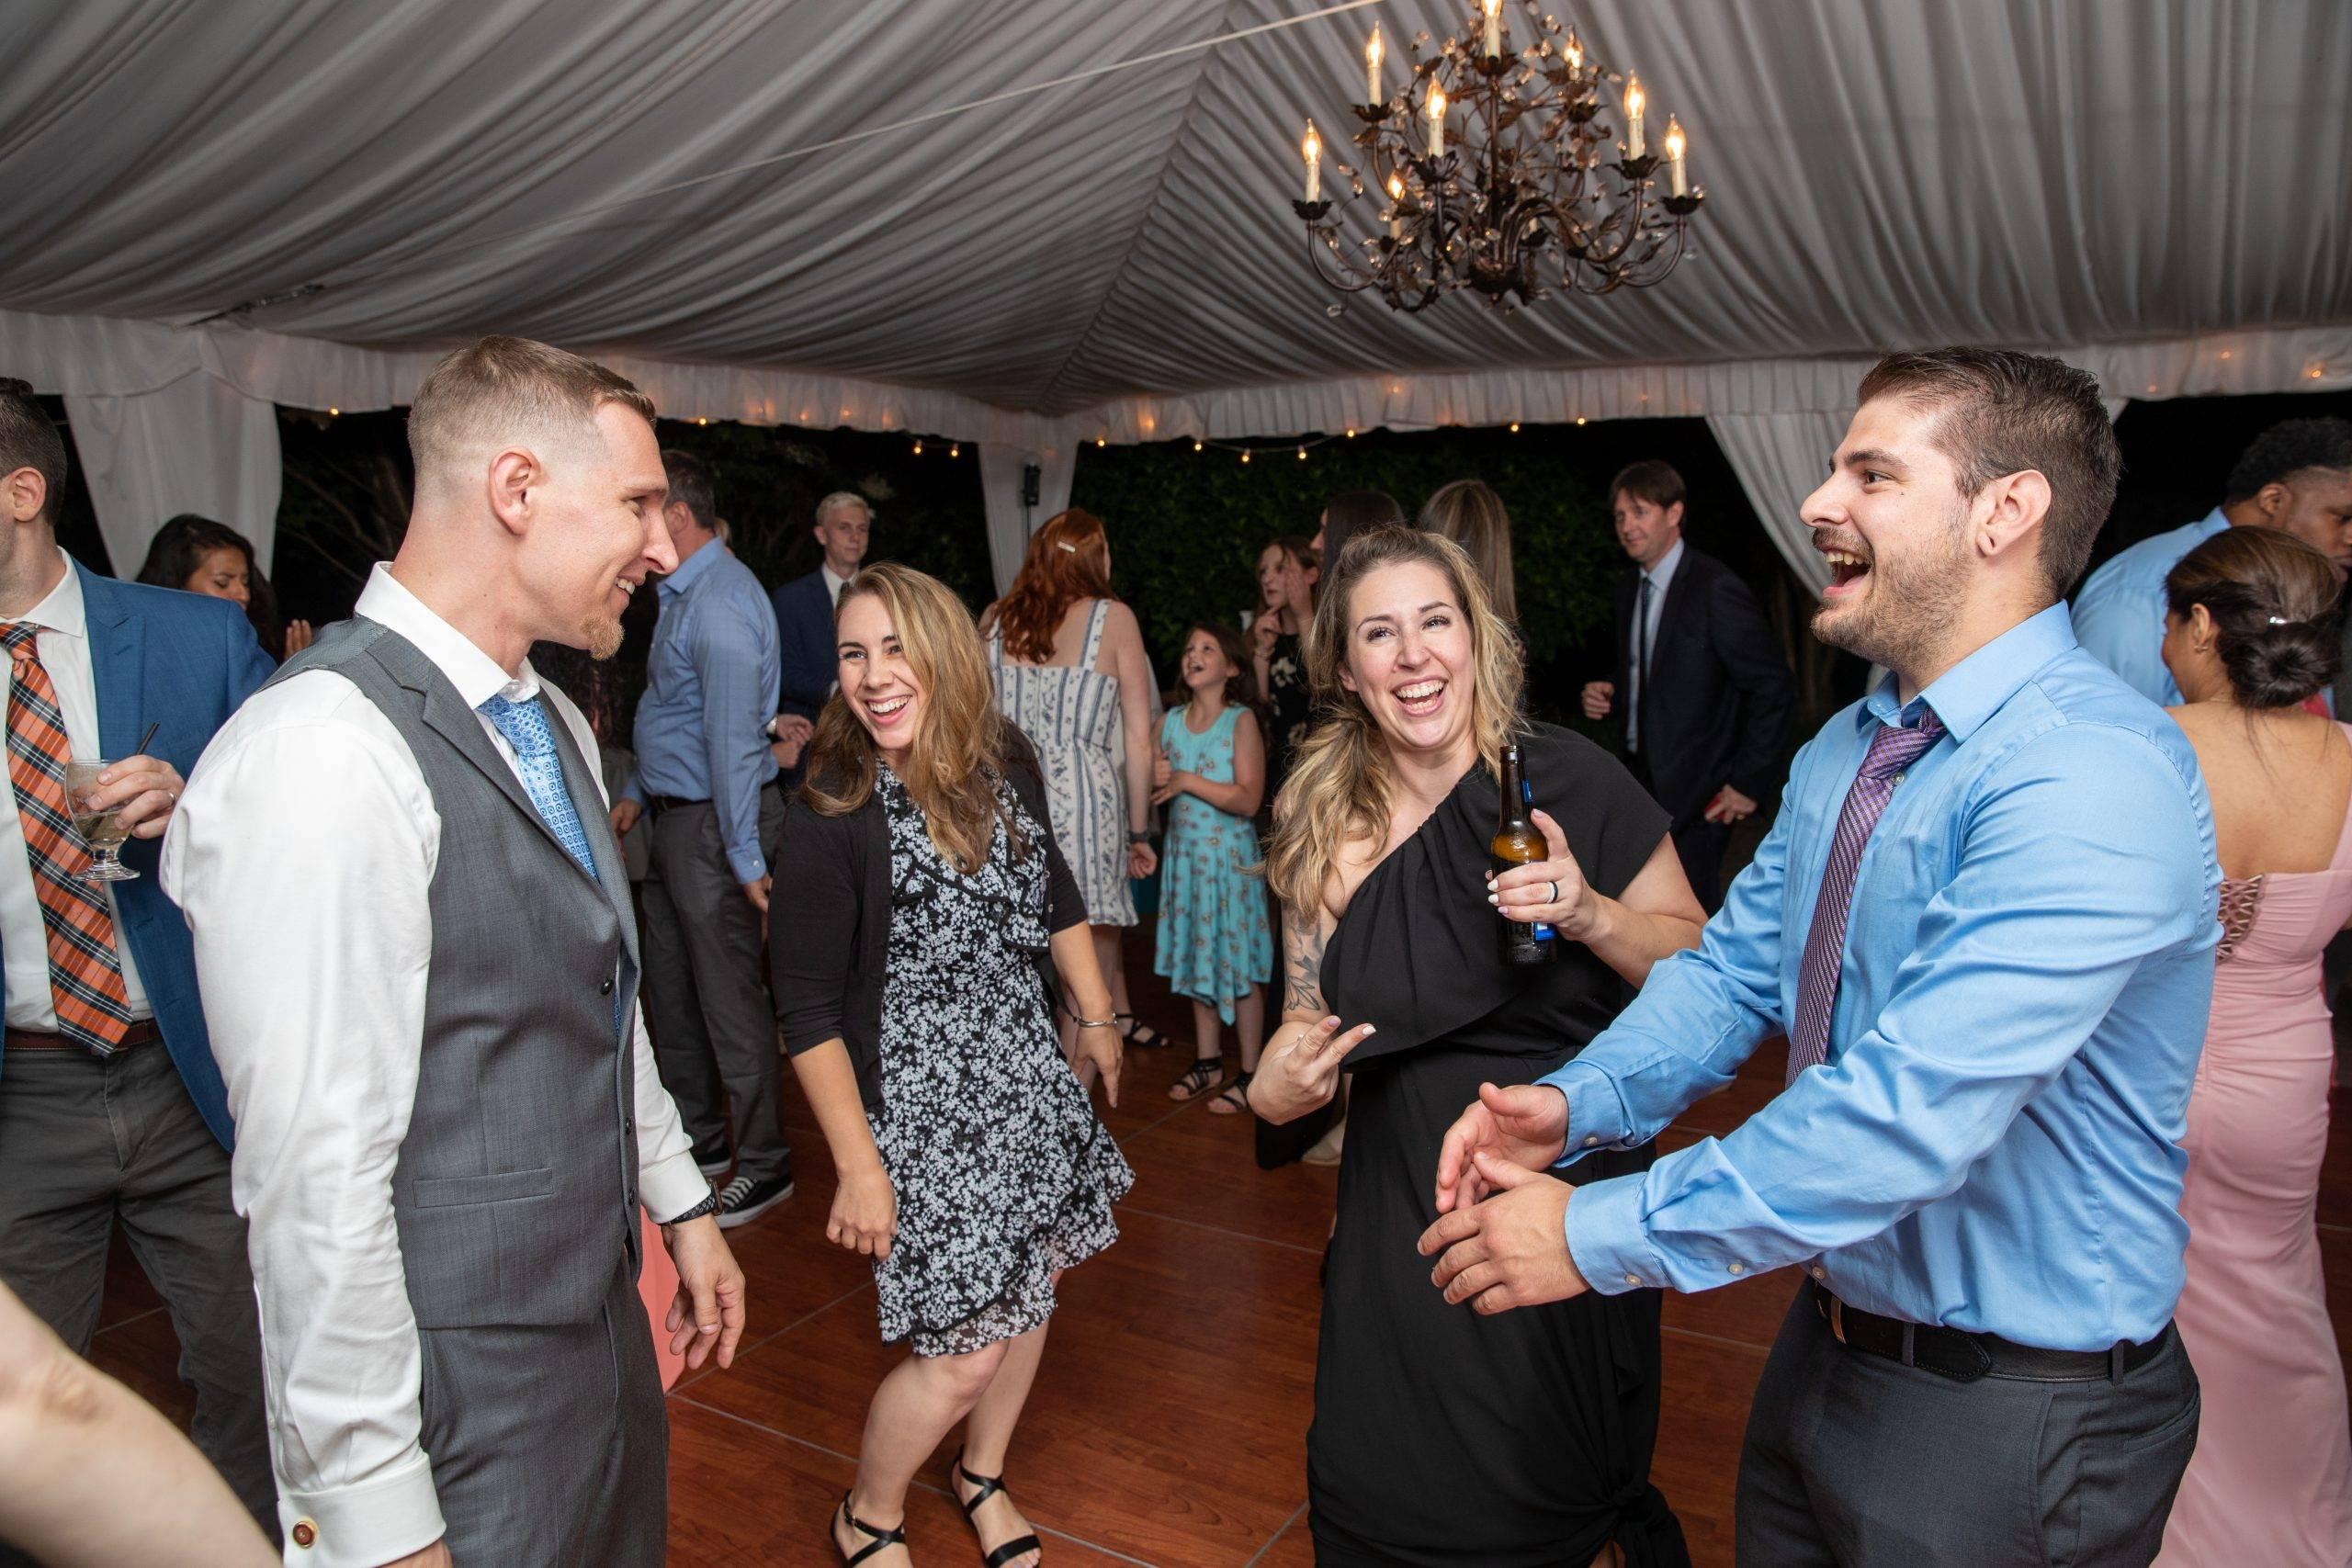 Olde Mill Inn dancing at wedding reception